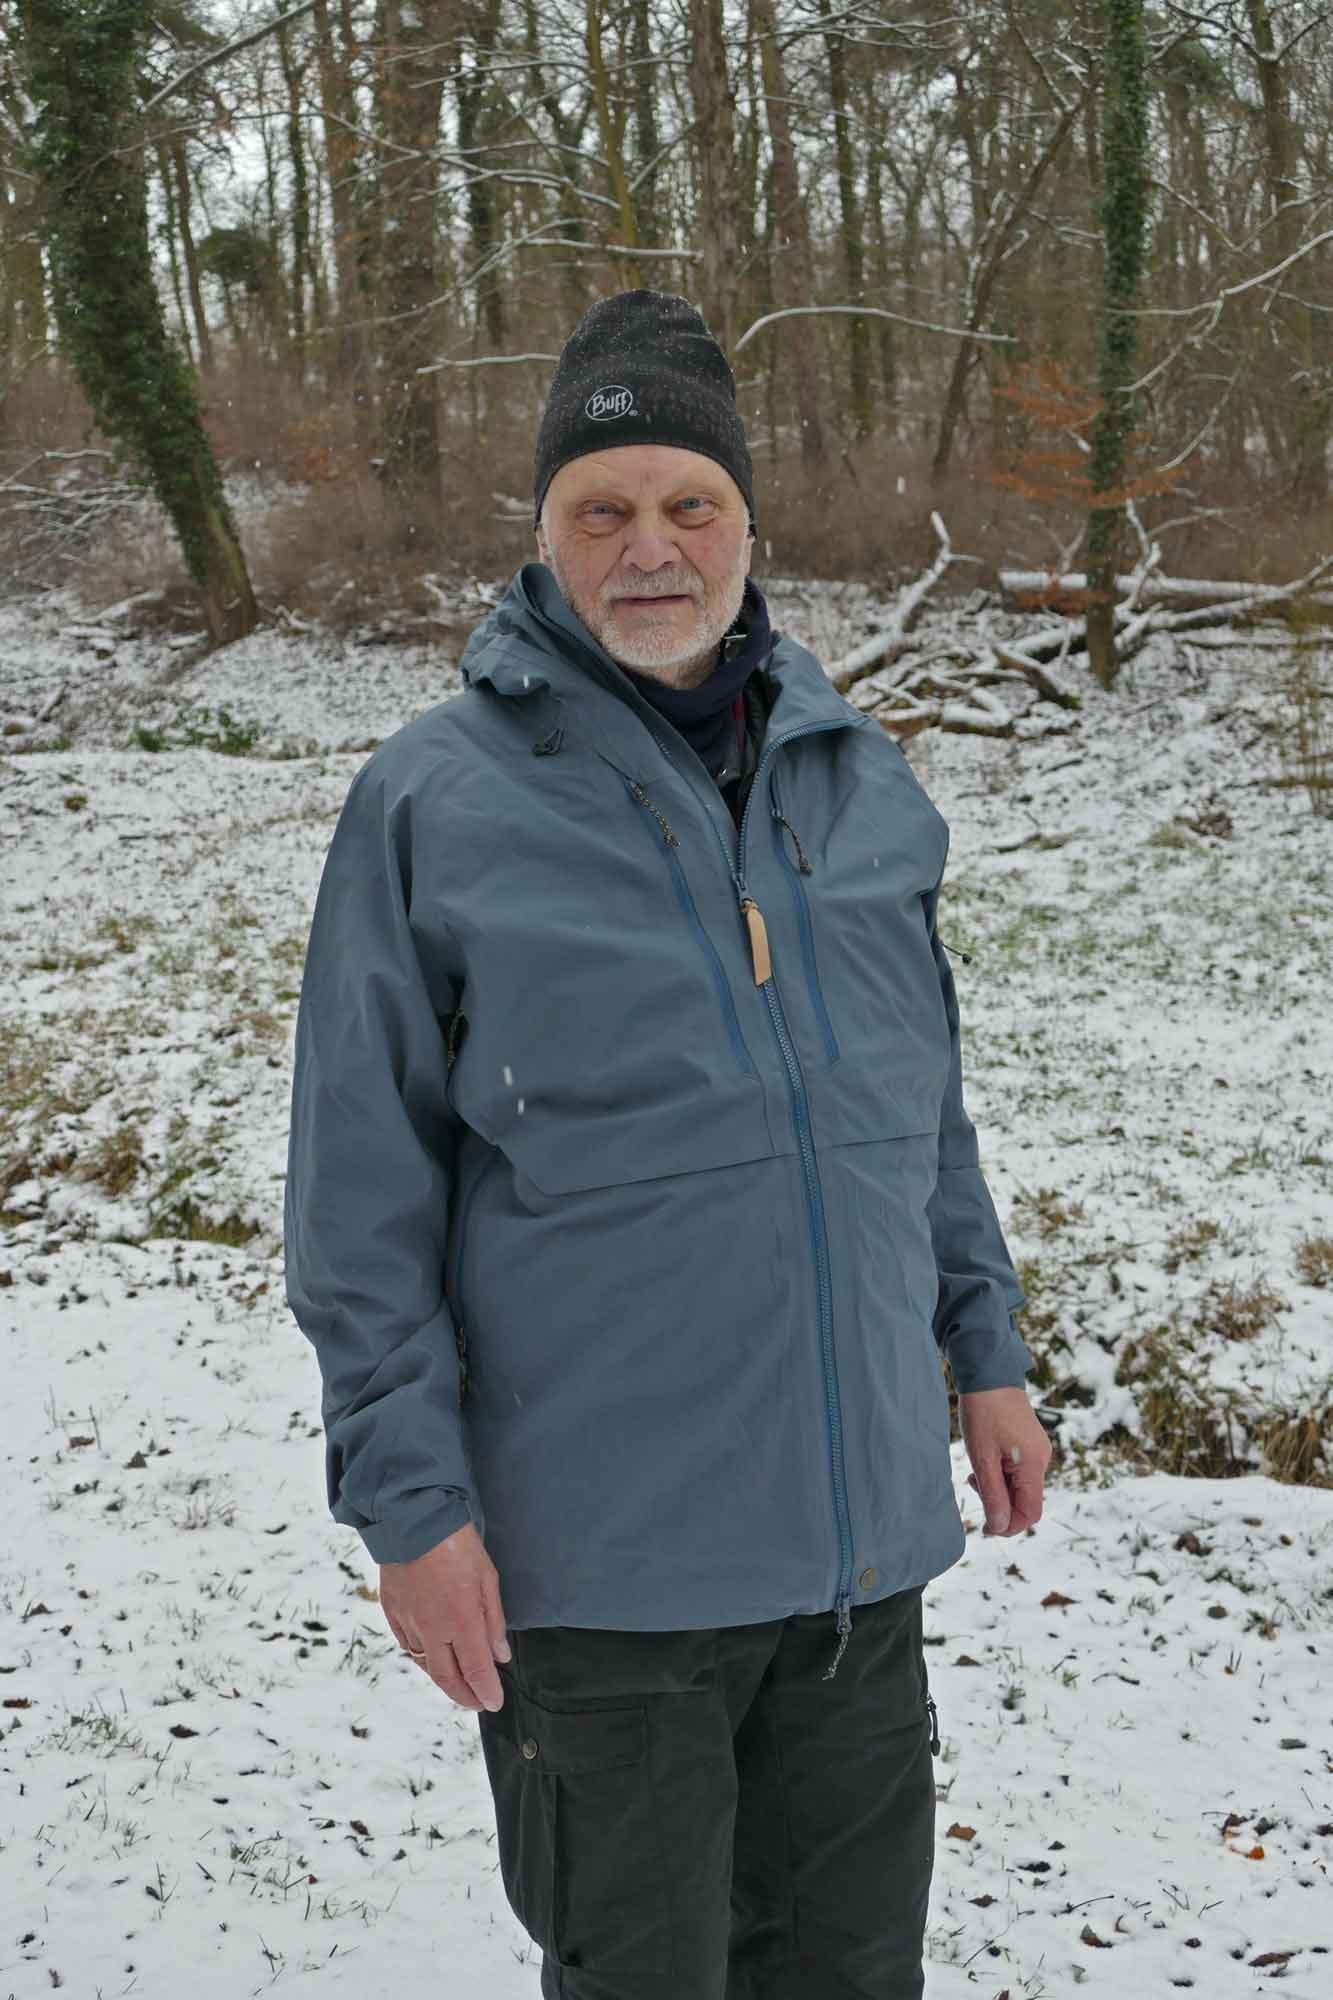 Fjällräven Keb Eco Jacket © U. Poller/ W. Todt